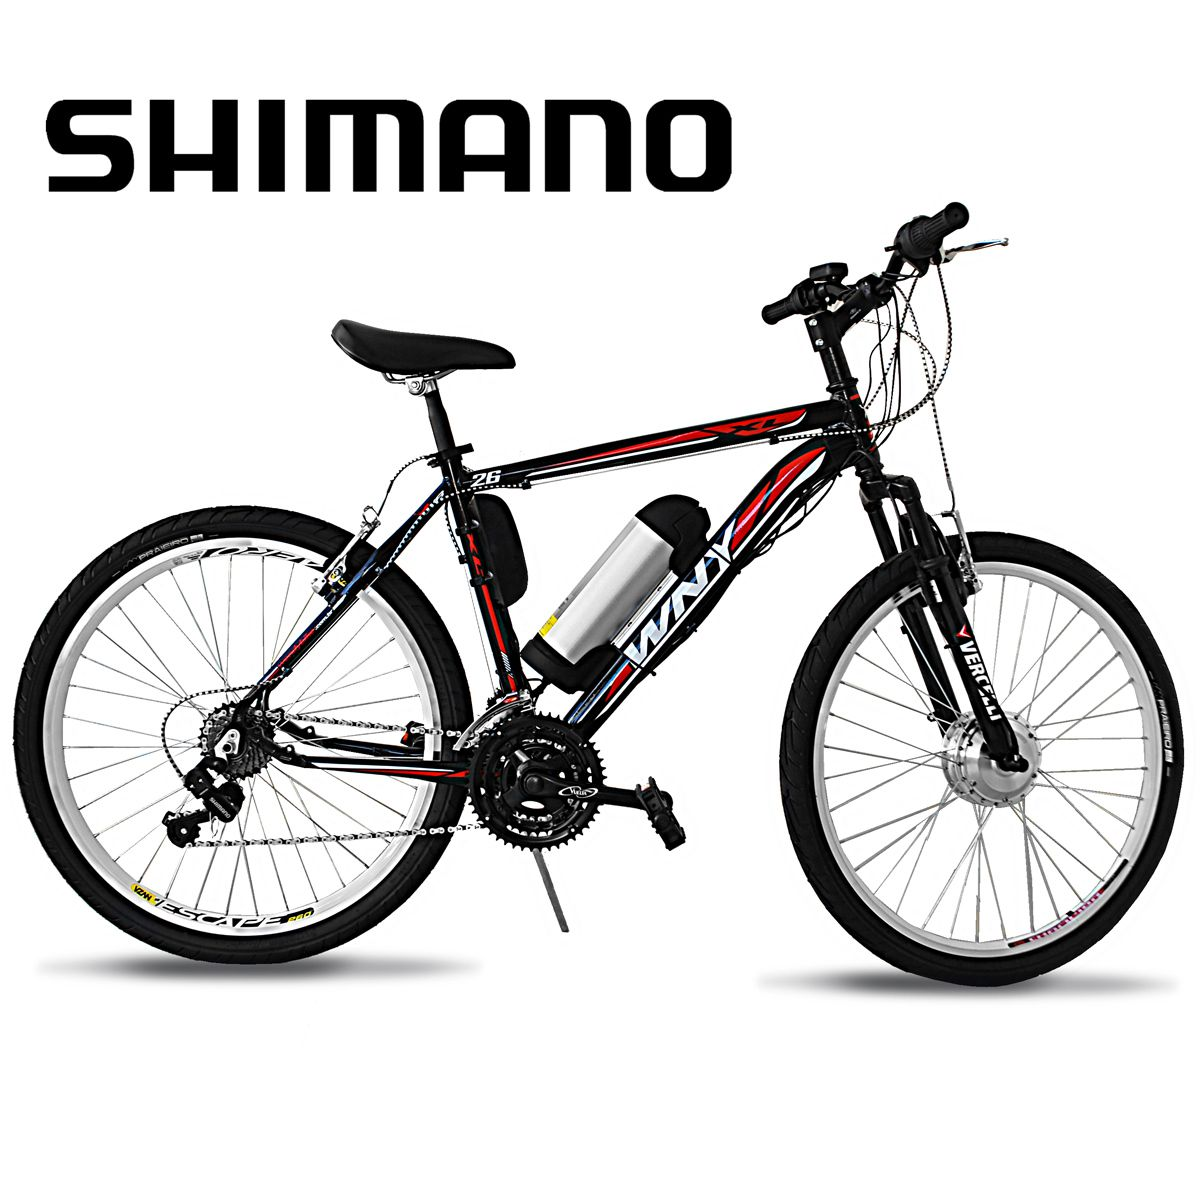 Bicicleta Elétrica Aro 26 Alumínio Bateria de LÍTIO TecUltra